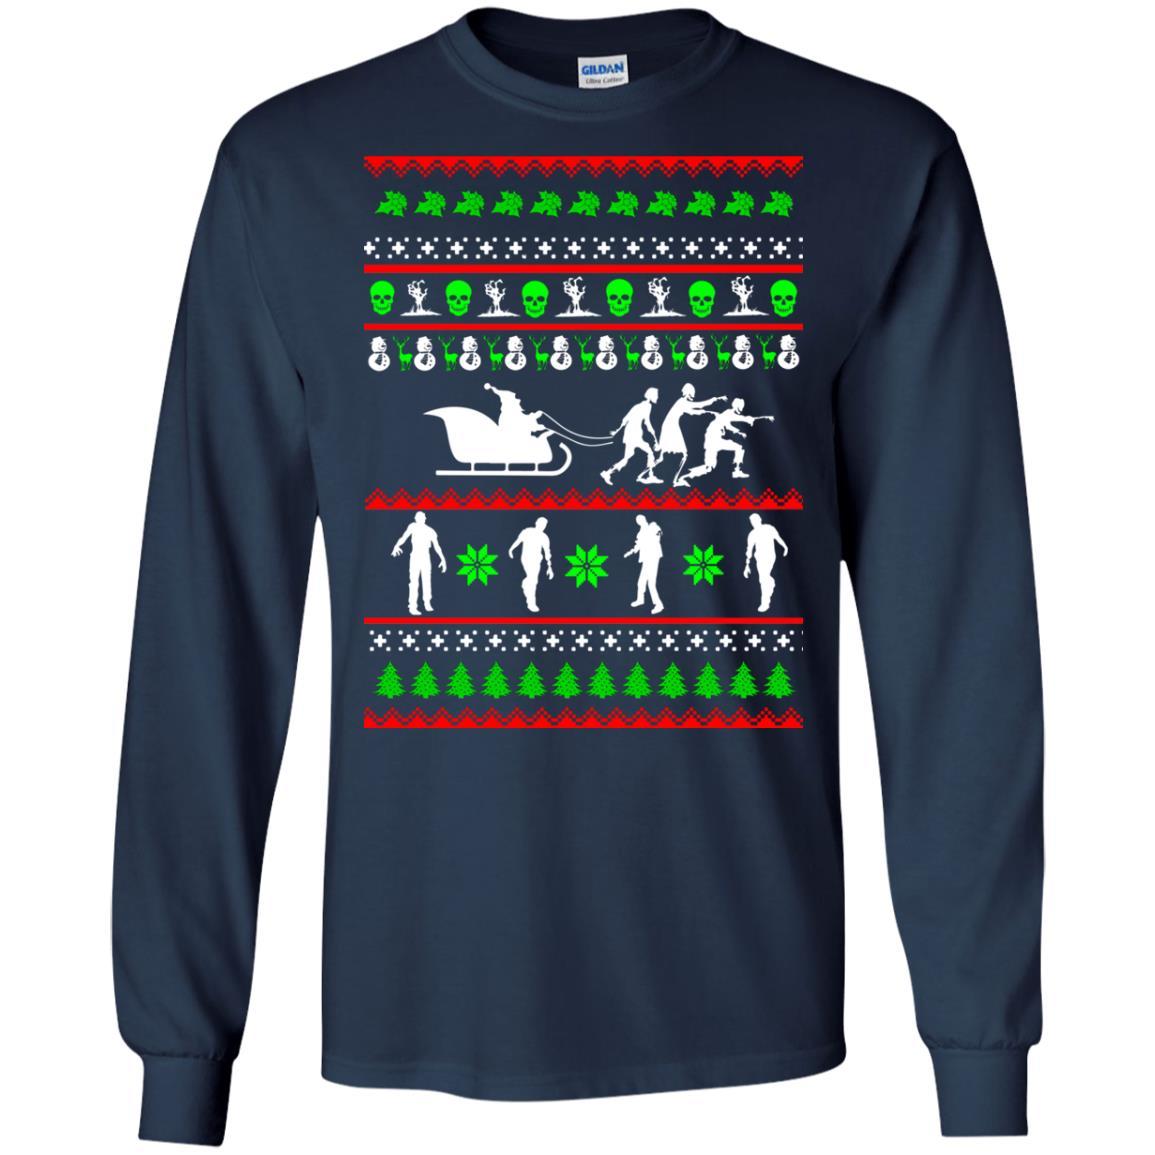 image 5832 - Zombie Christmas Sweater, Hoodie